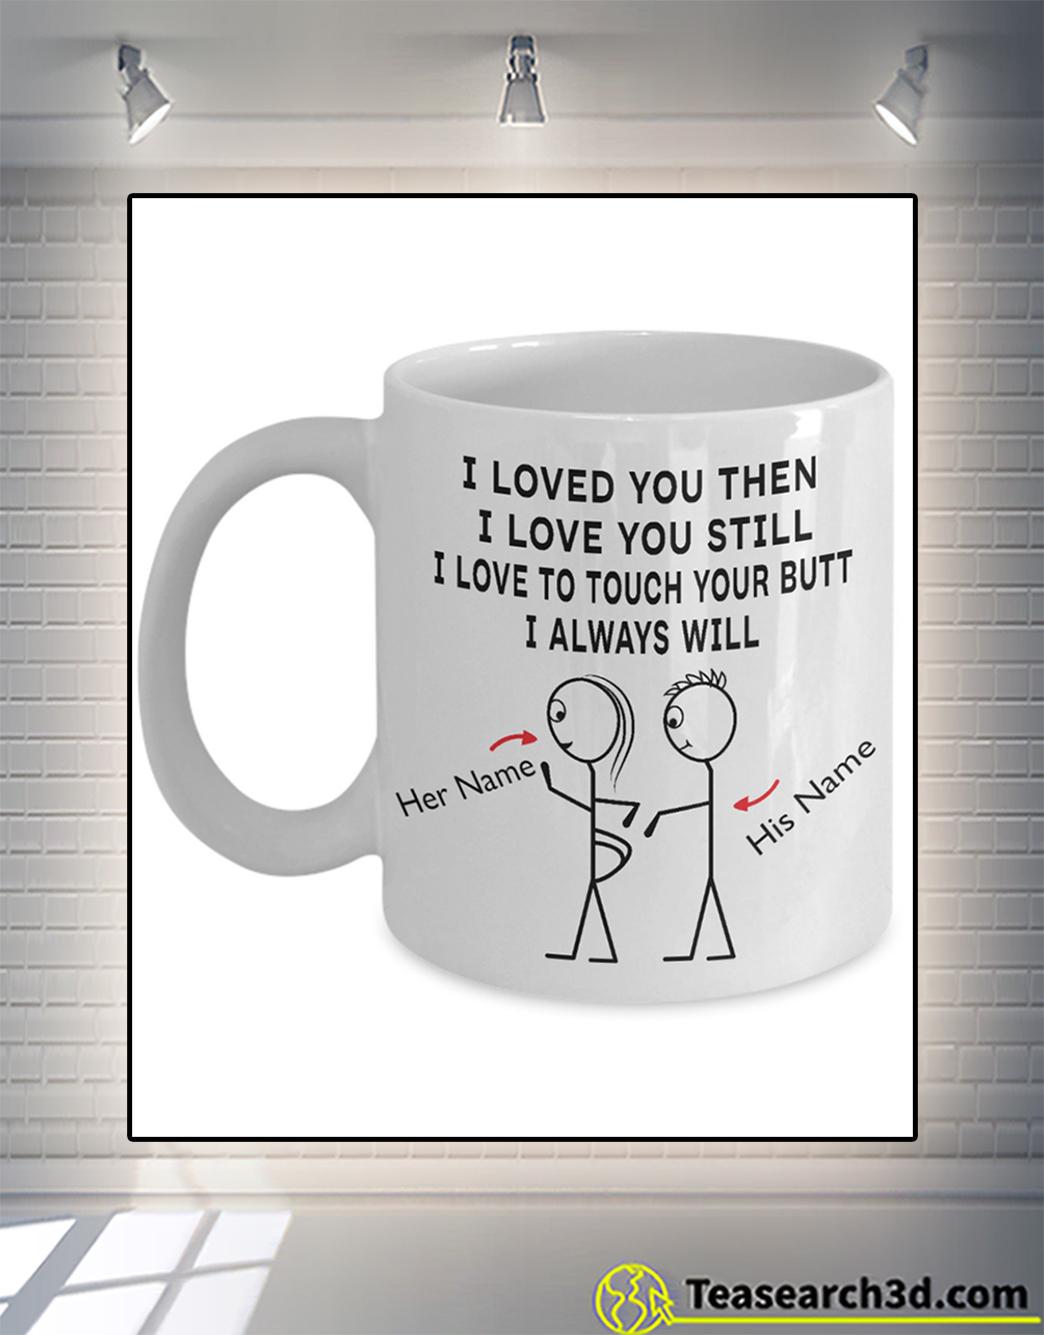 I love you then I love you still personalized custom name mug 15oz